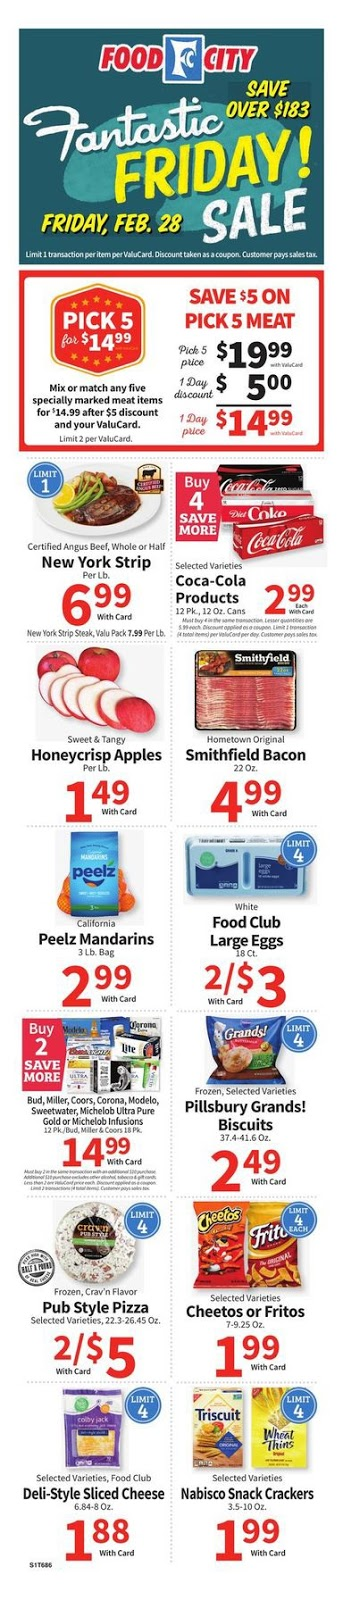 ⭐ Food City Ad 2/26/20 ⭐ Food City Weekly Ad February 26 2020